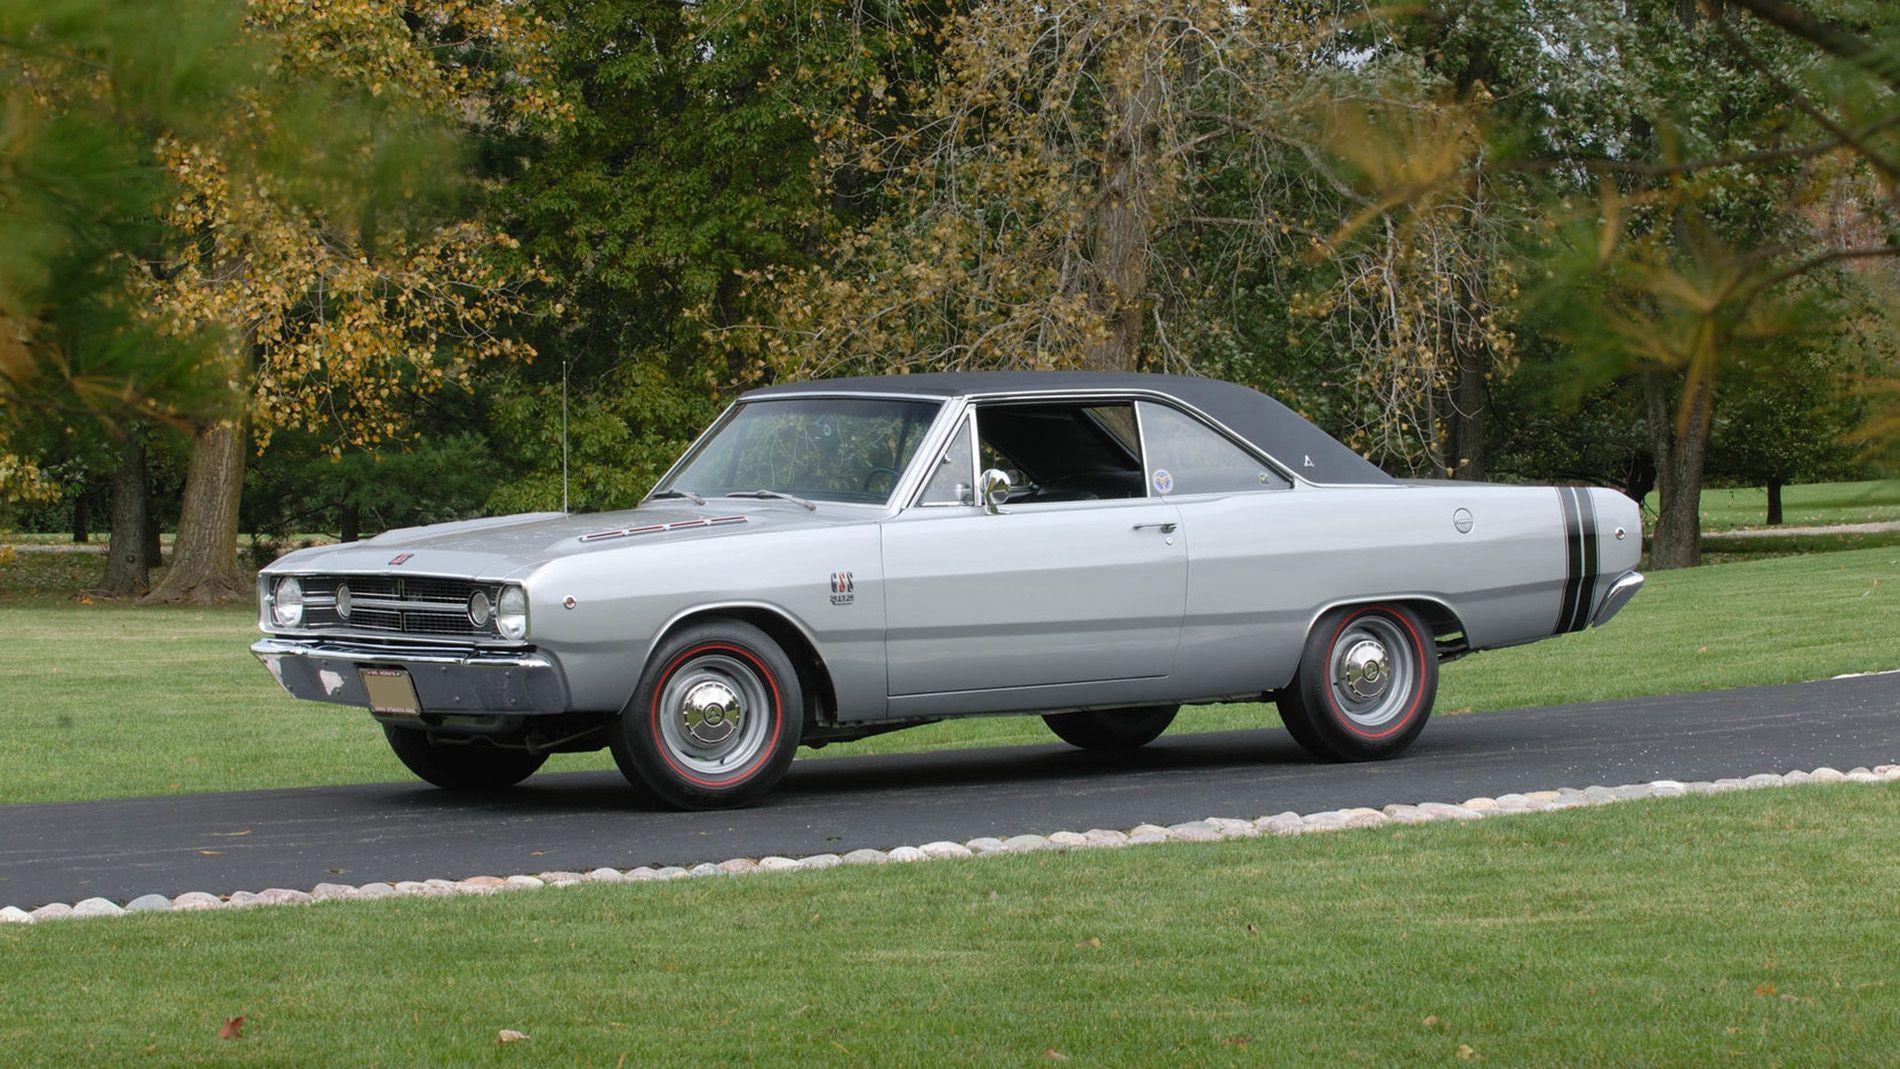 1969 Dodge Dart Gts M Code 440 Dodge Dart Muscle Cars